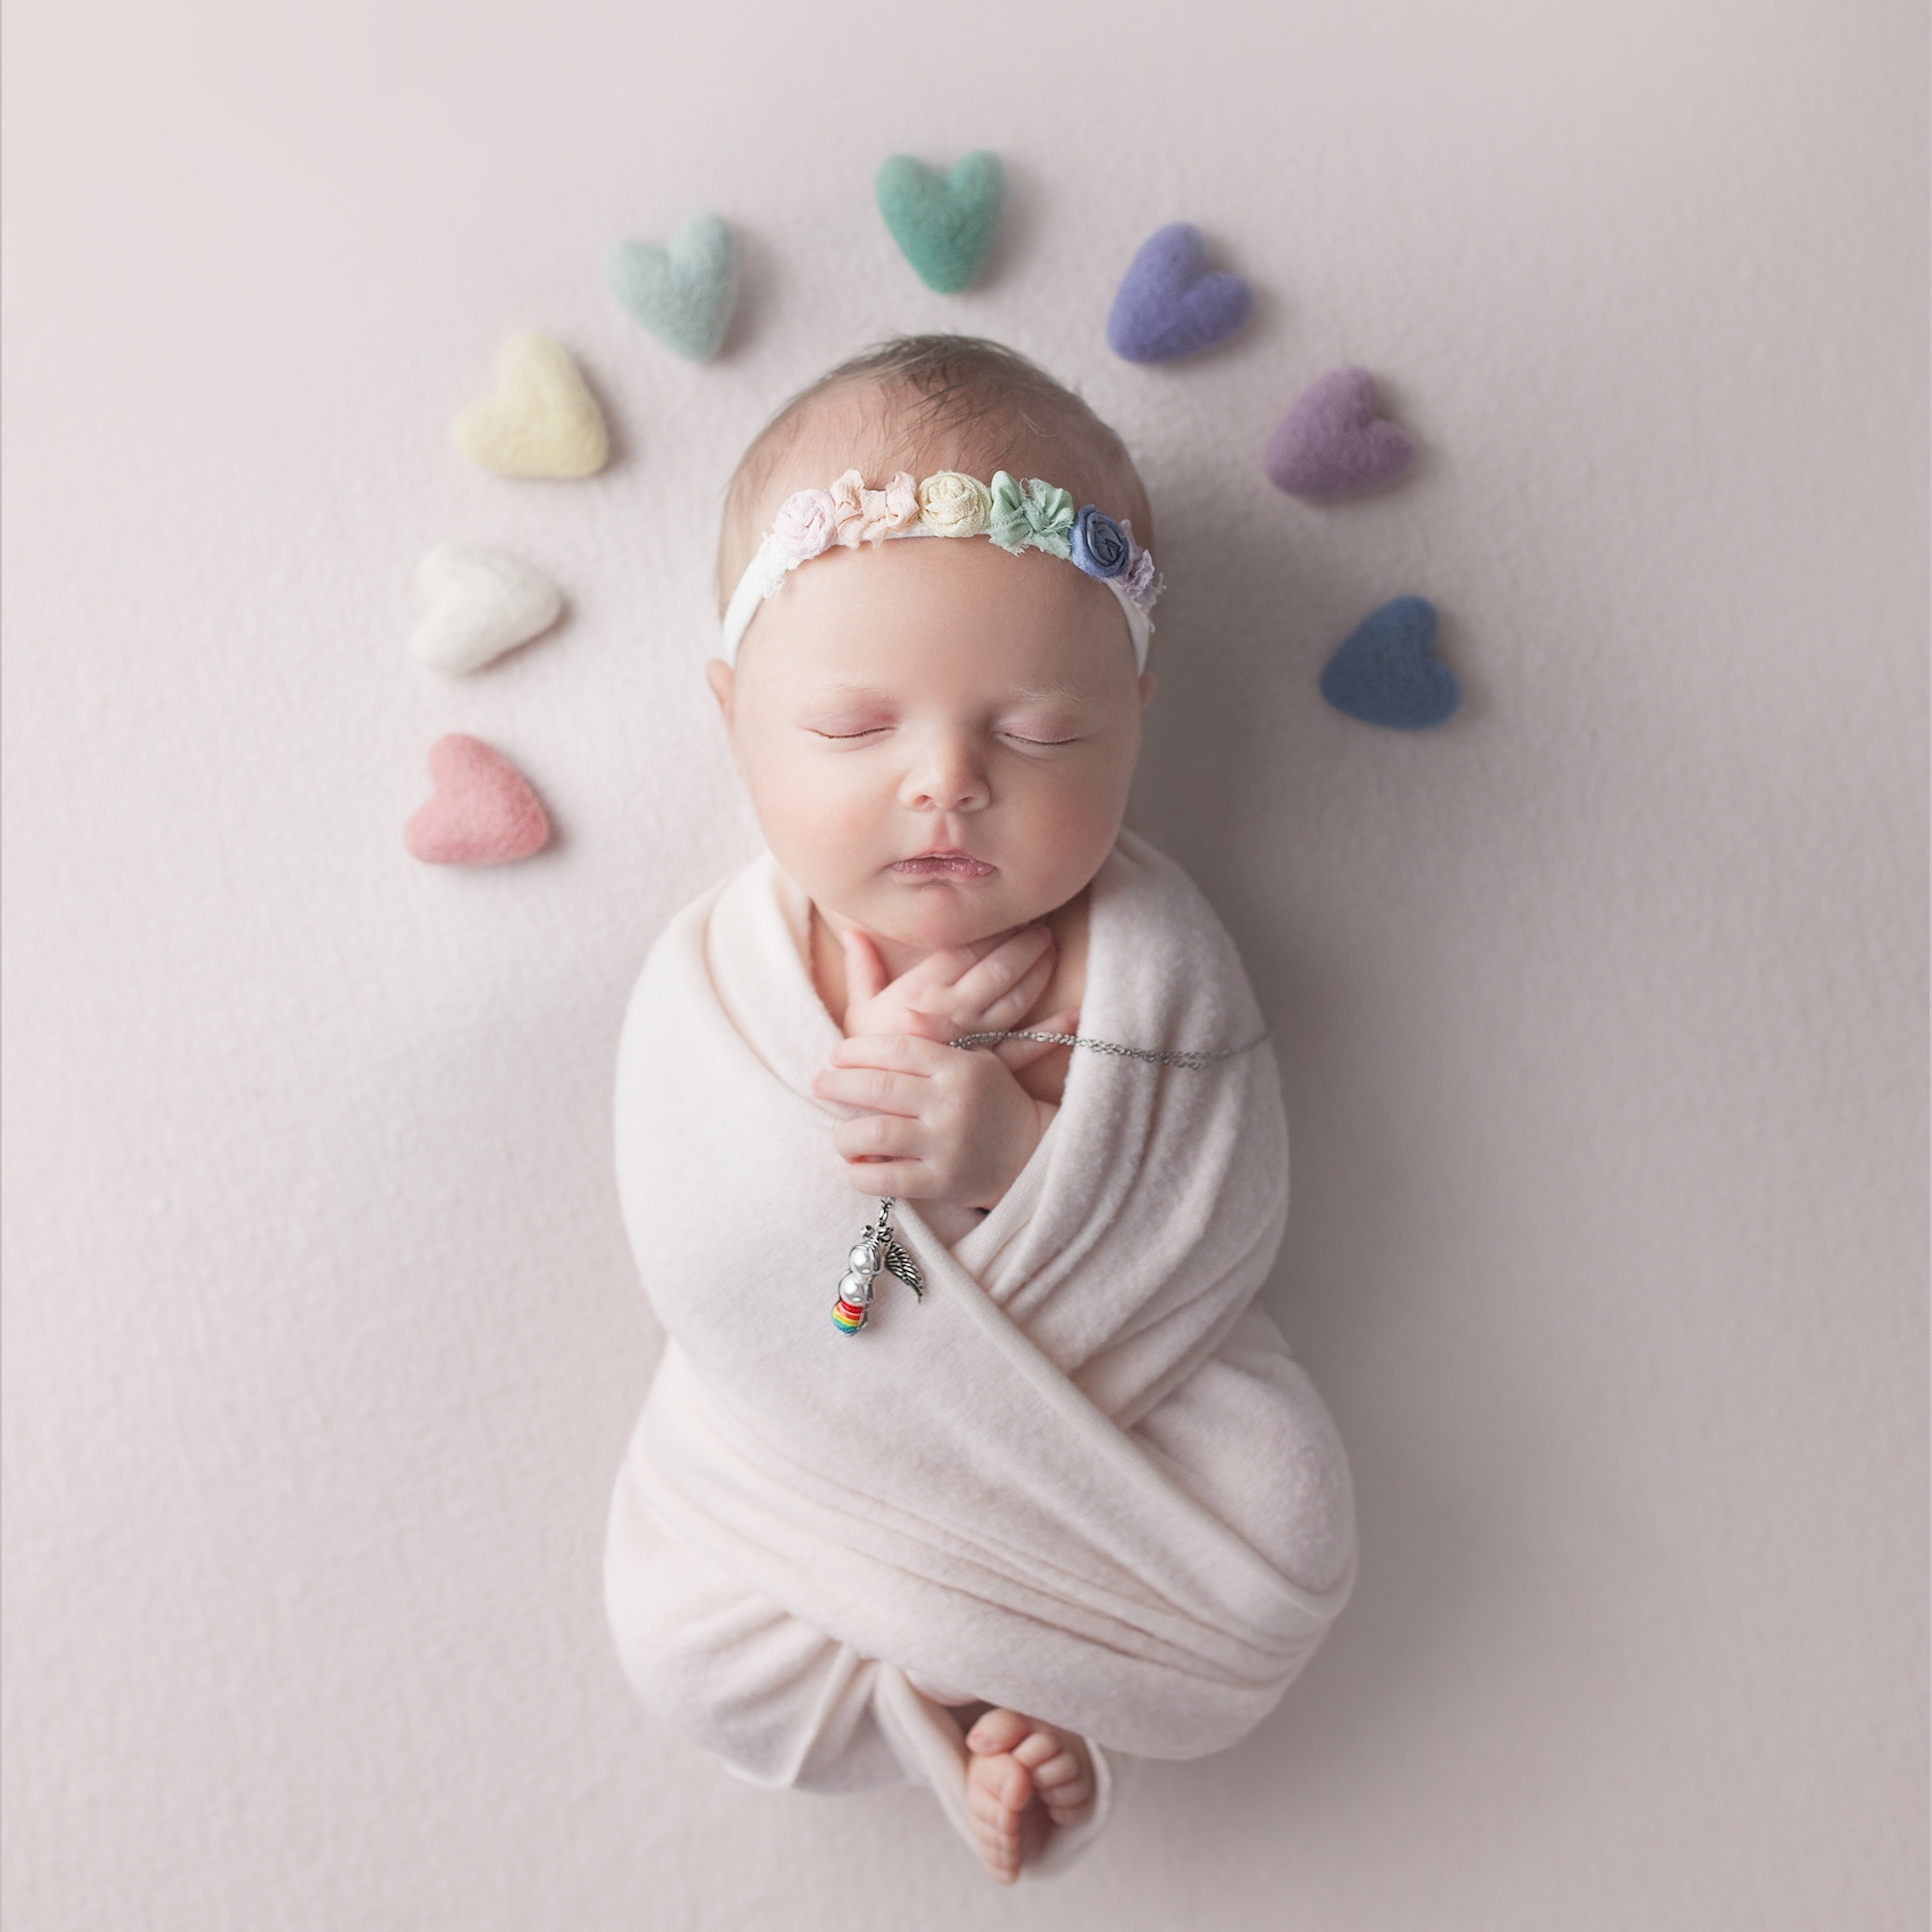 Mid-Missouri Newborn Photographer- Imago Dei Newborn Photography